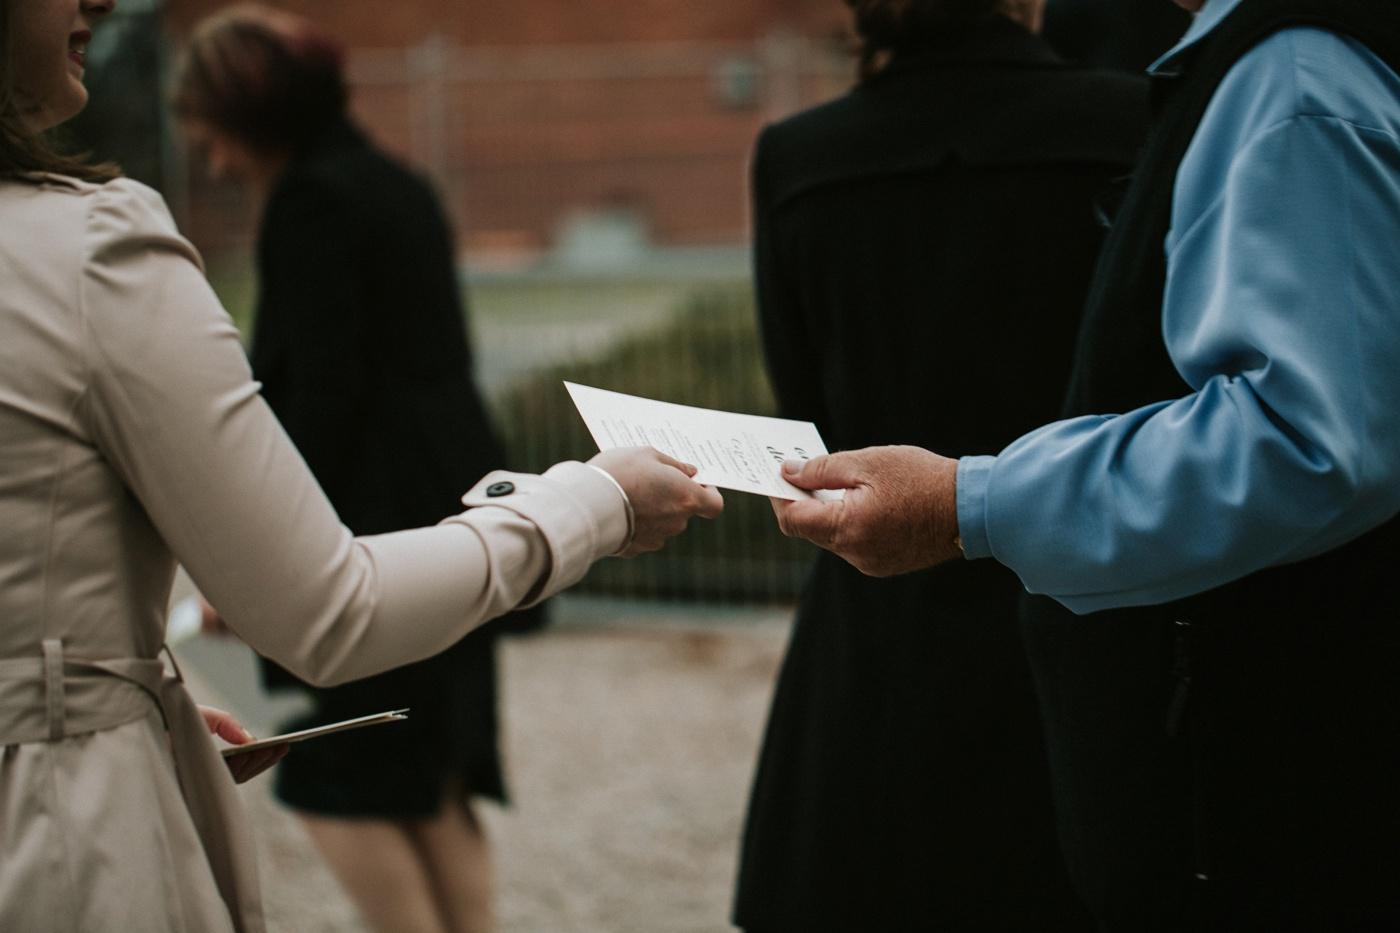 anitadaniel_melbourne-scienceworks-relaxed-fun-geek-wedding_melbourne-candid-wedding-photography_30